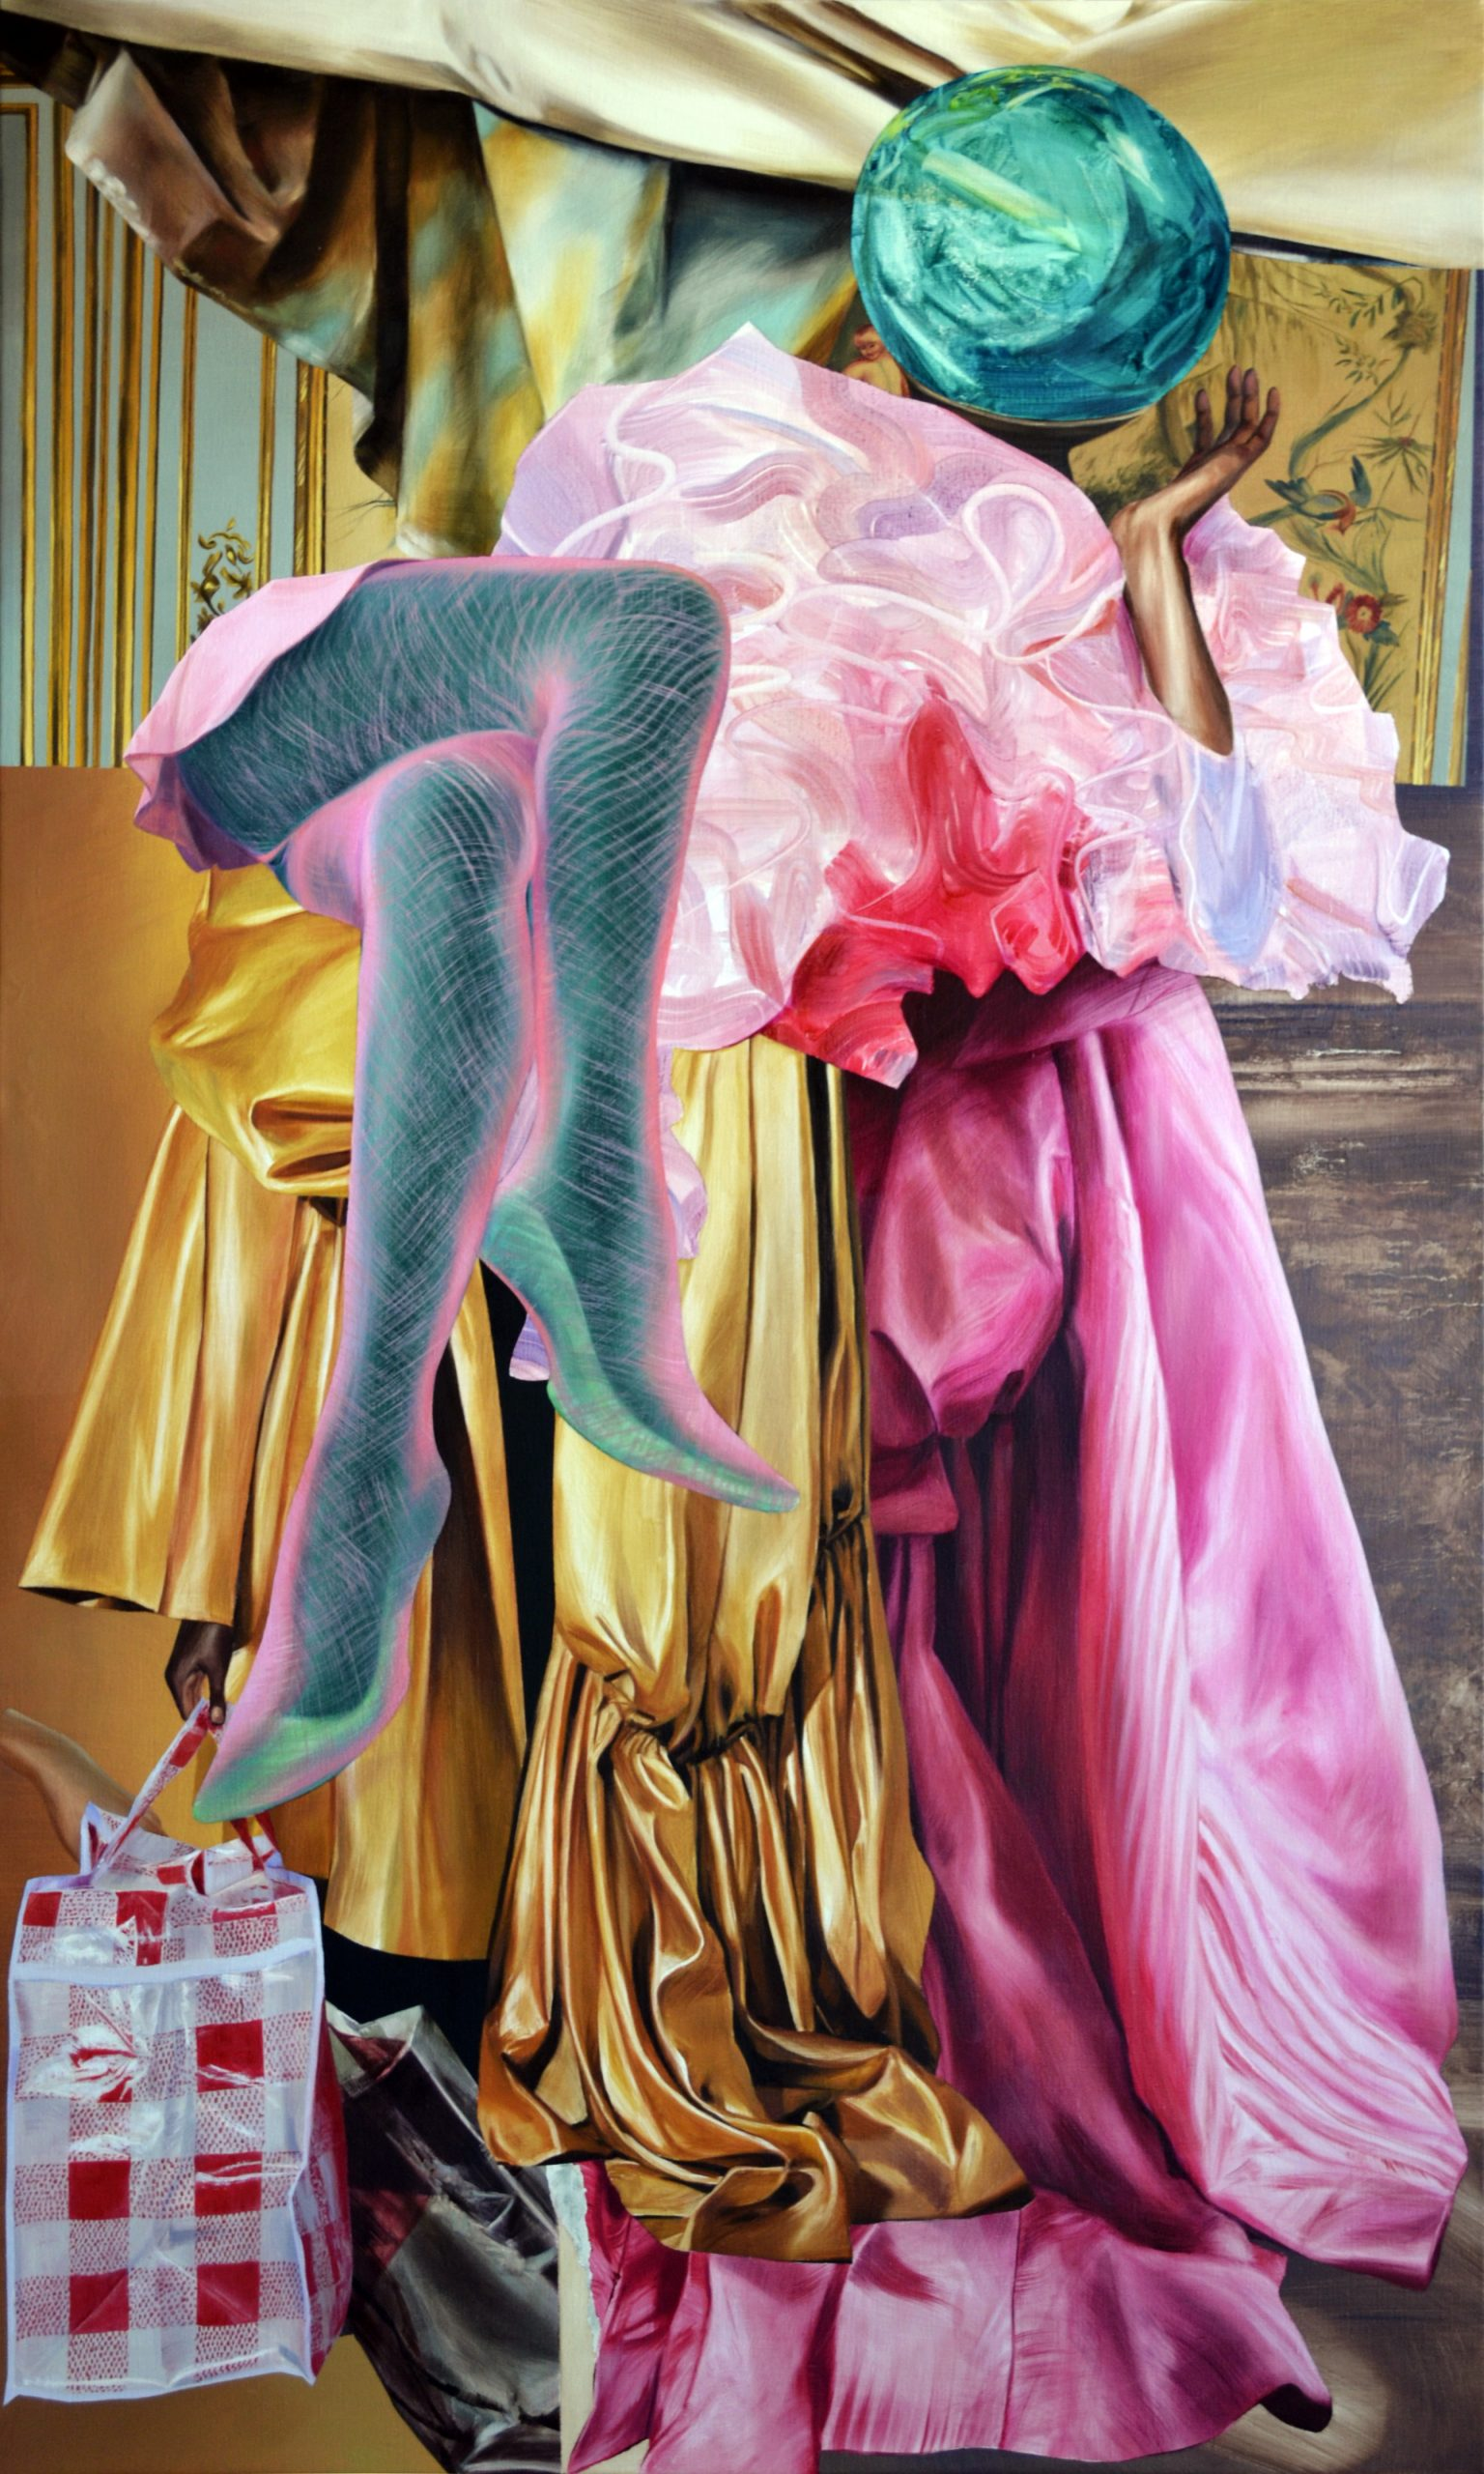 Martyna Borowiecka. Delightful afternoon heaviness. 170 x 100 cm. Oil on canvas. 2019